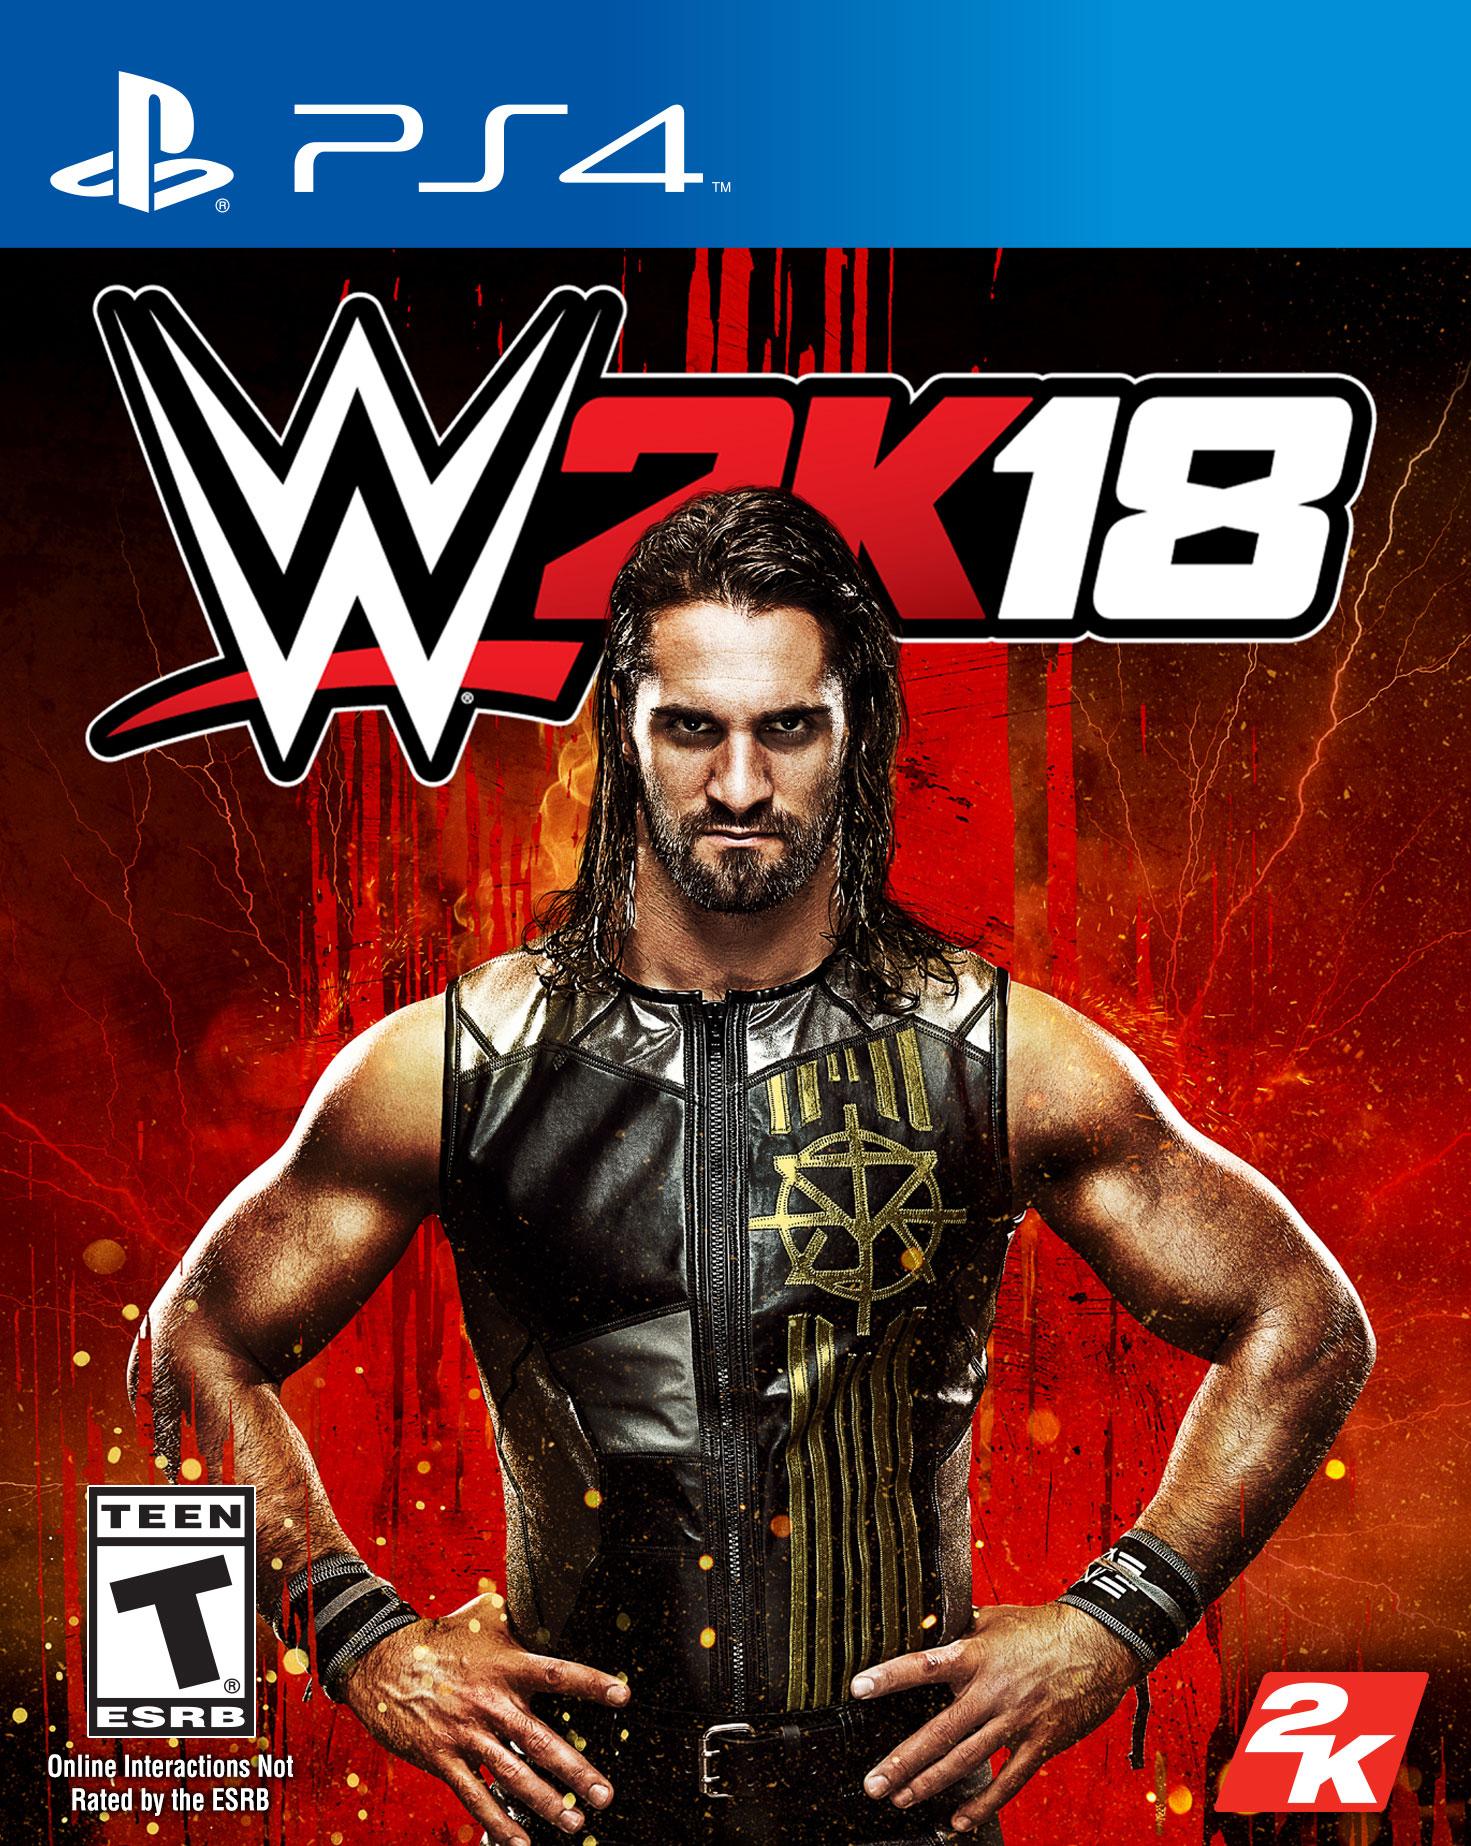 WWE 2K 18 - 2